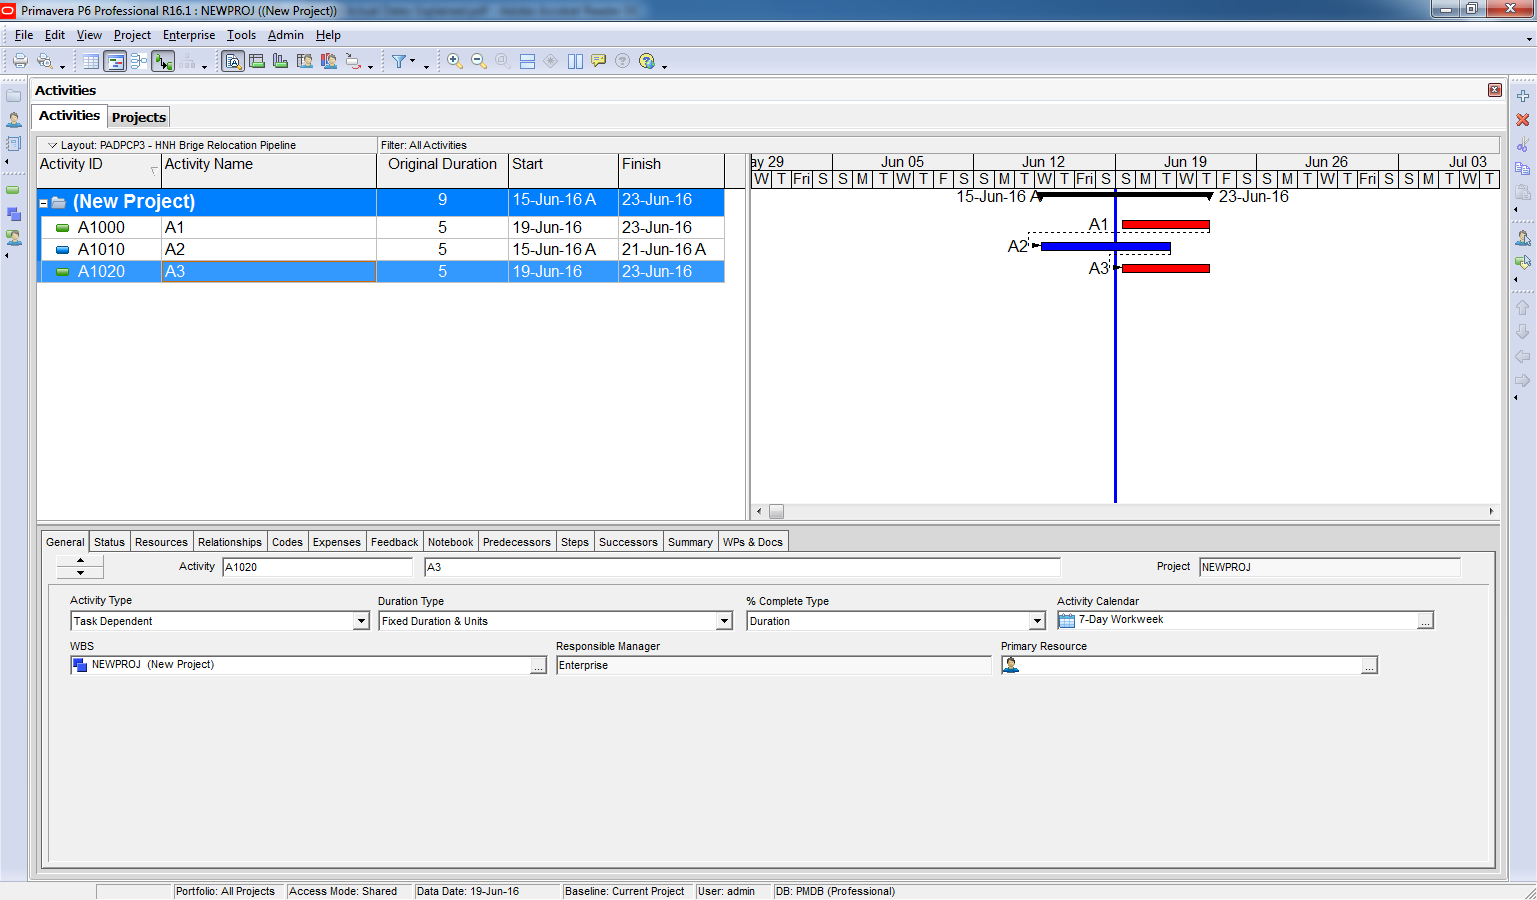 Scheduling using the Progress Override option